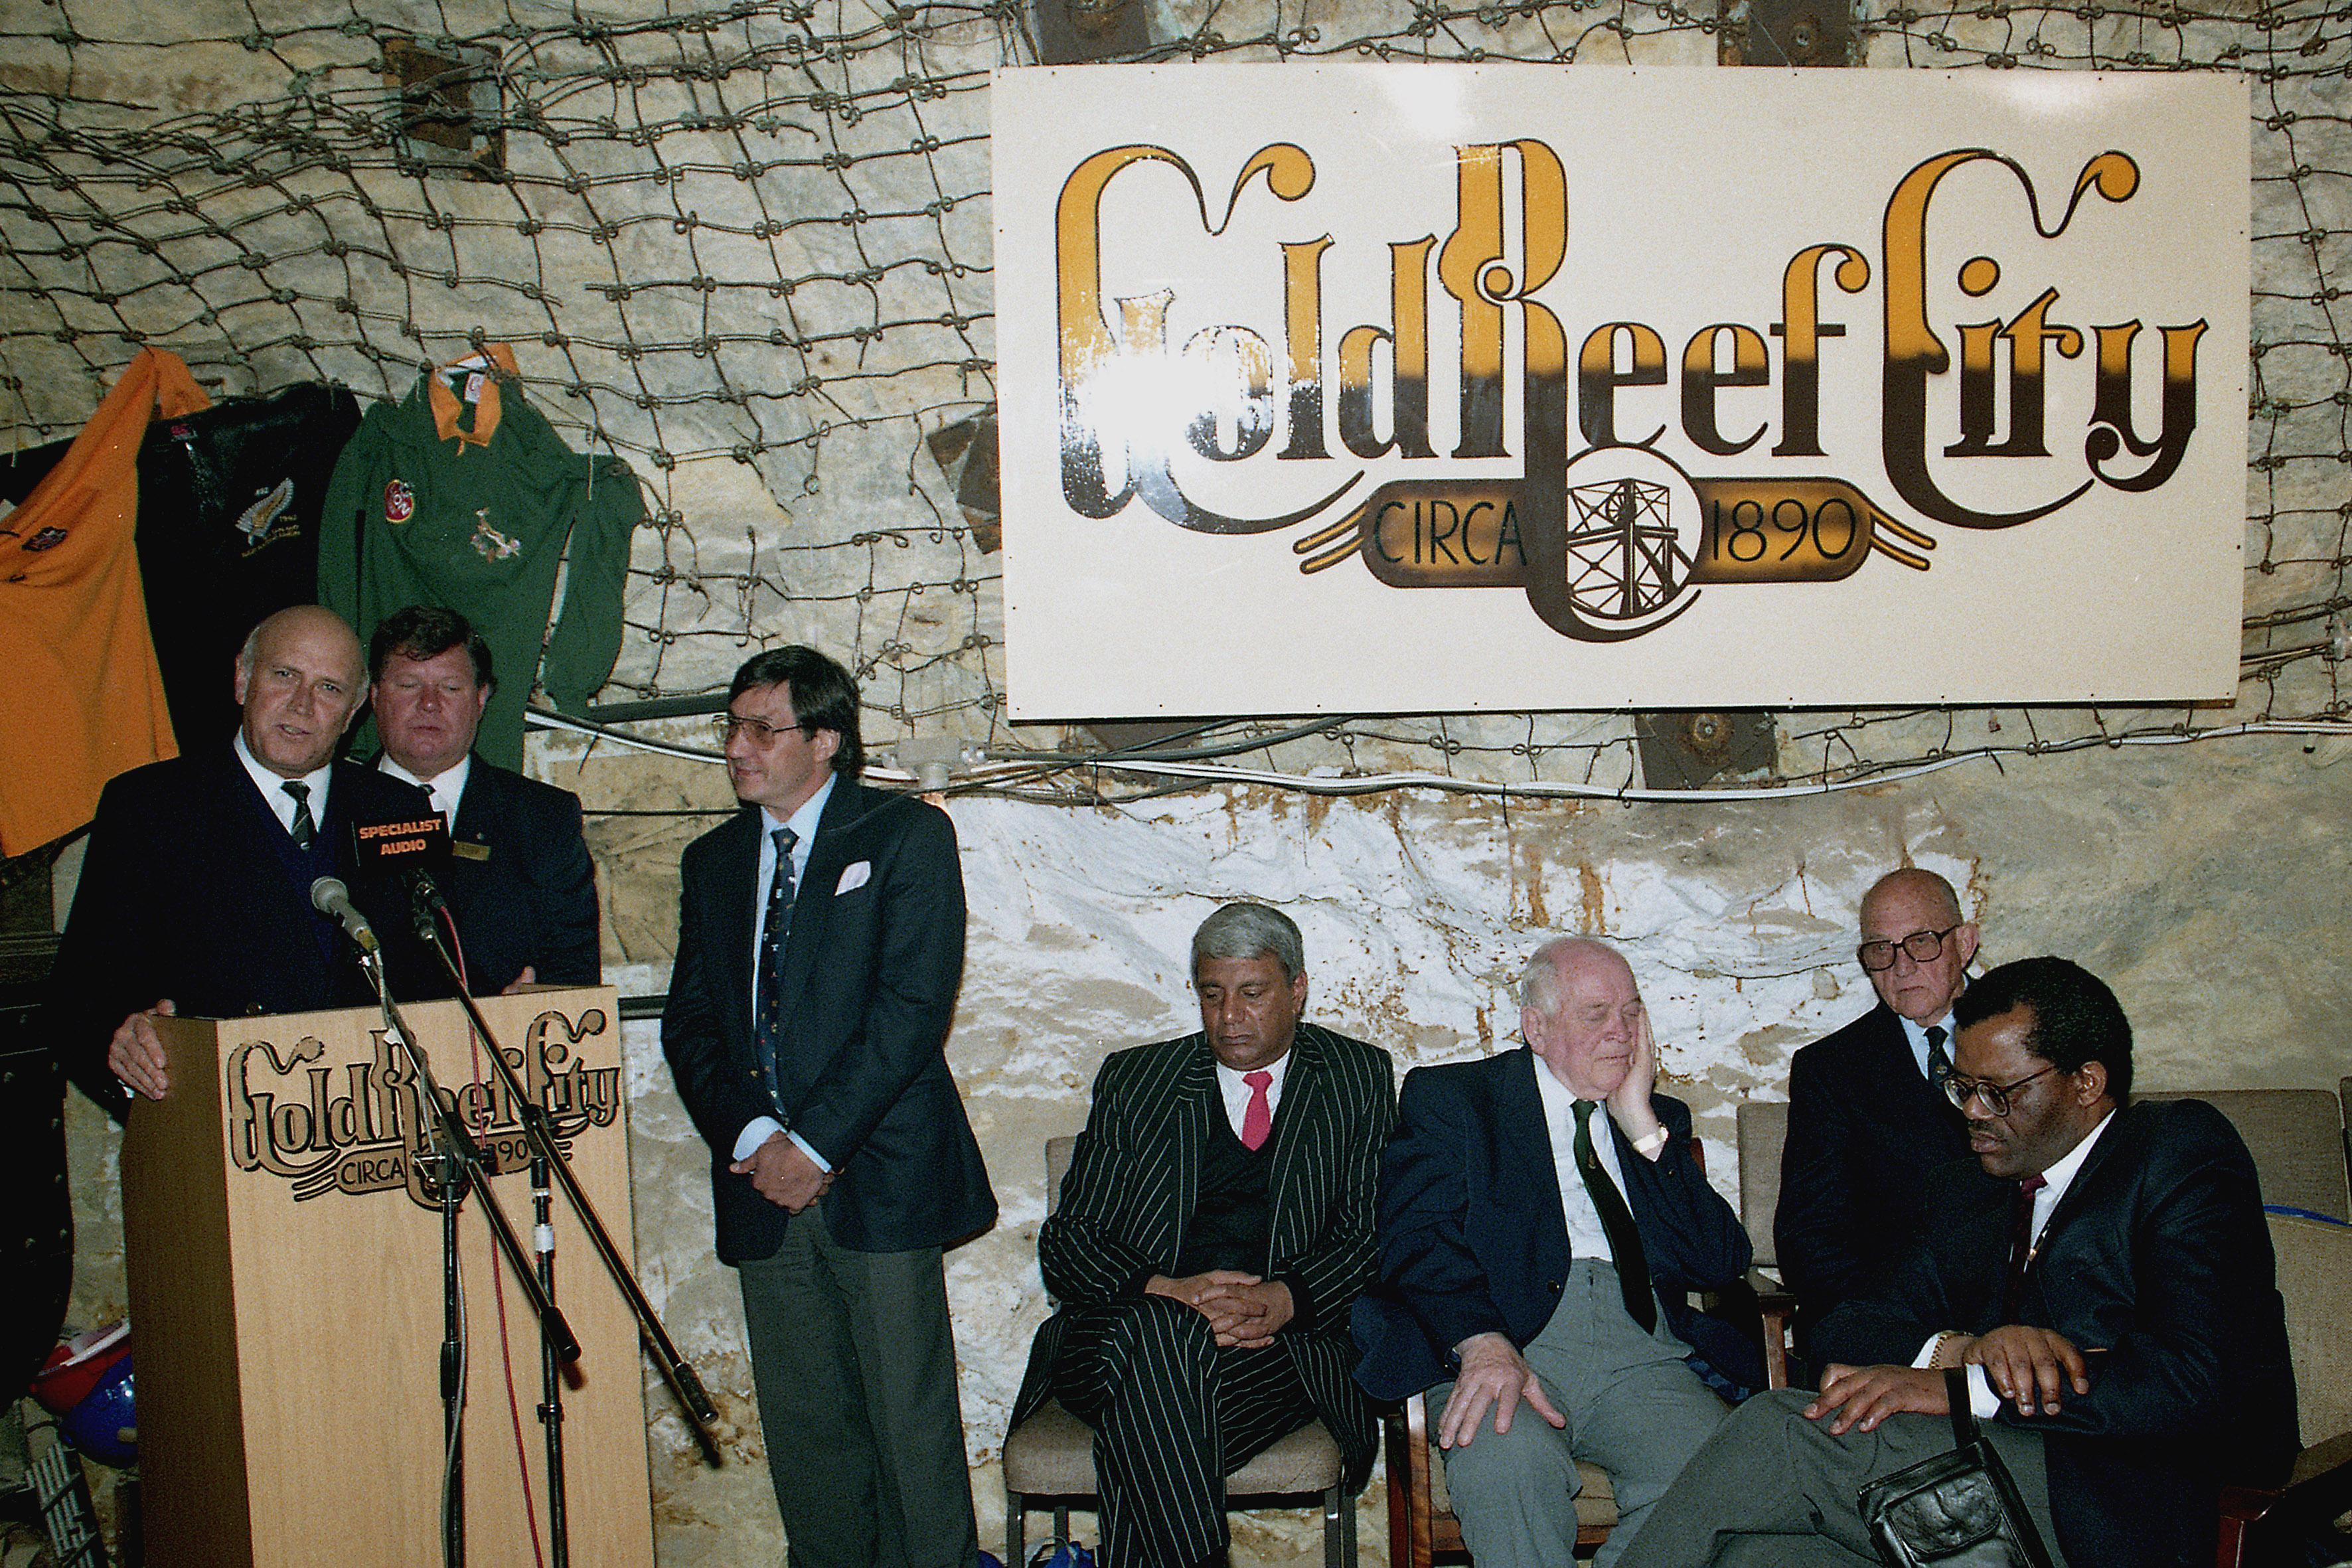 Forging unity in rugby: FW de Klerk, Ben Schutte, Ebrahim Patel, Danie Craven and Steve Tshwete pictured...